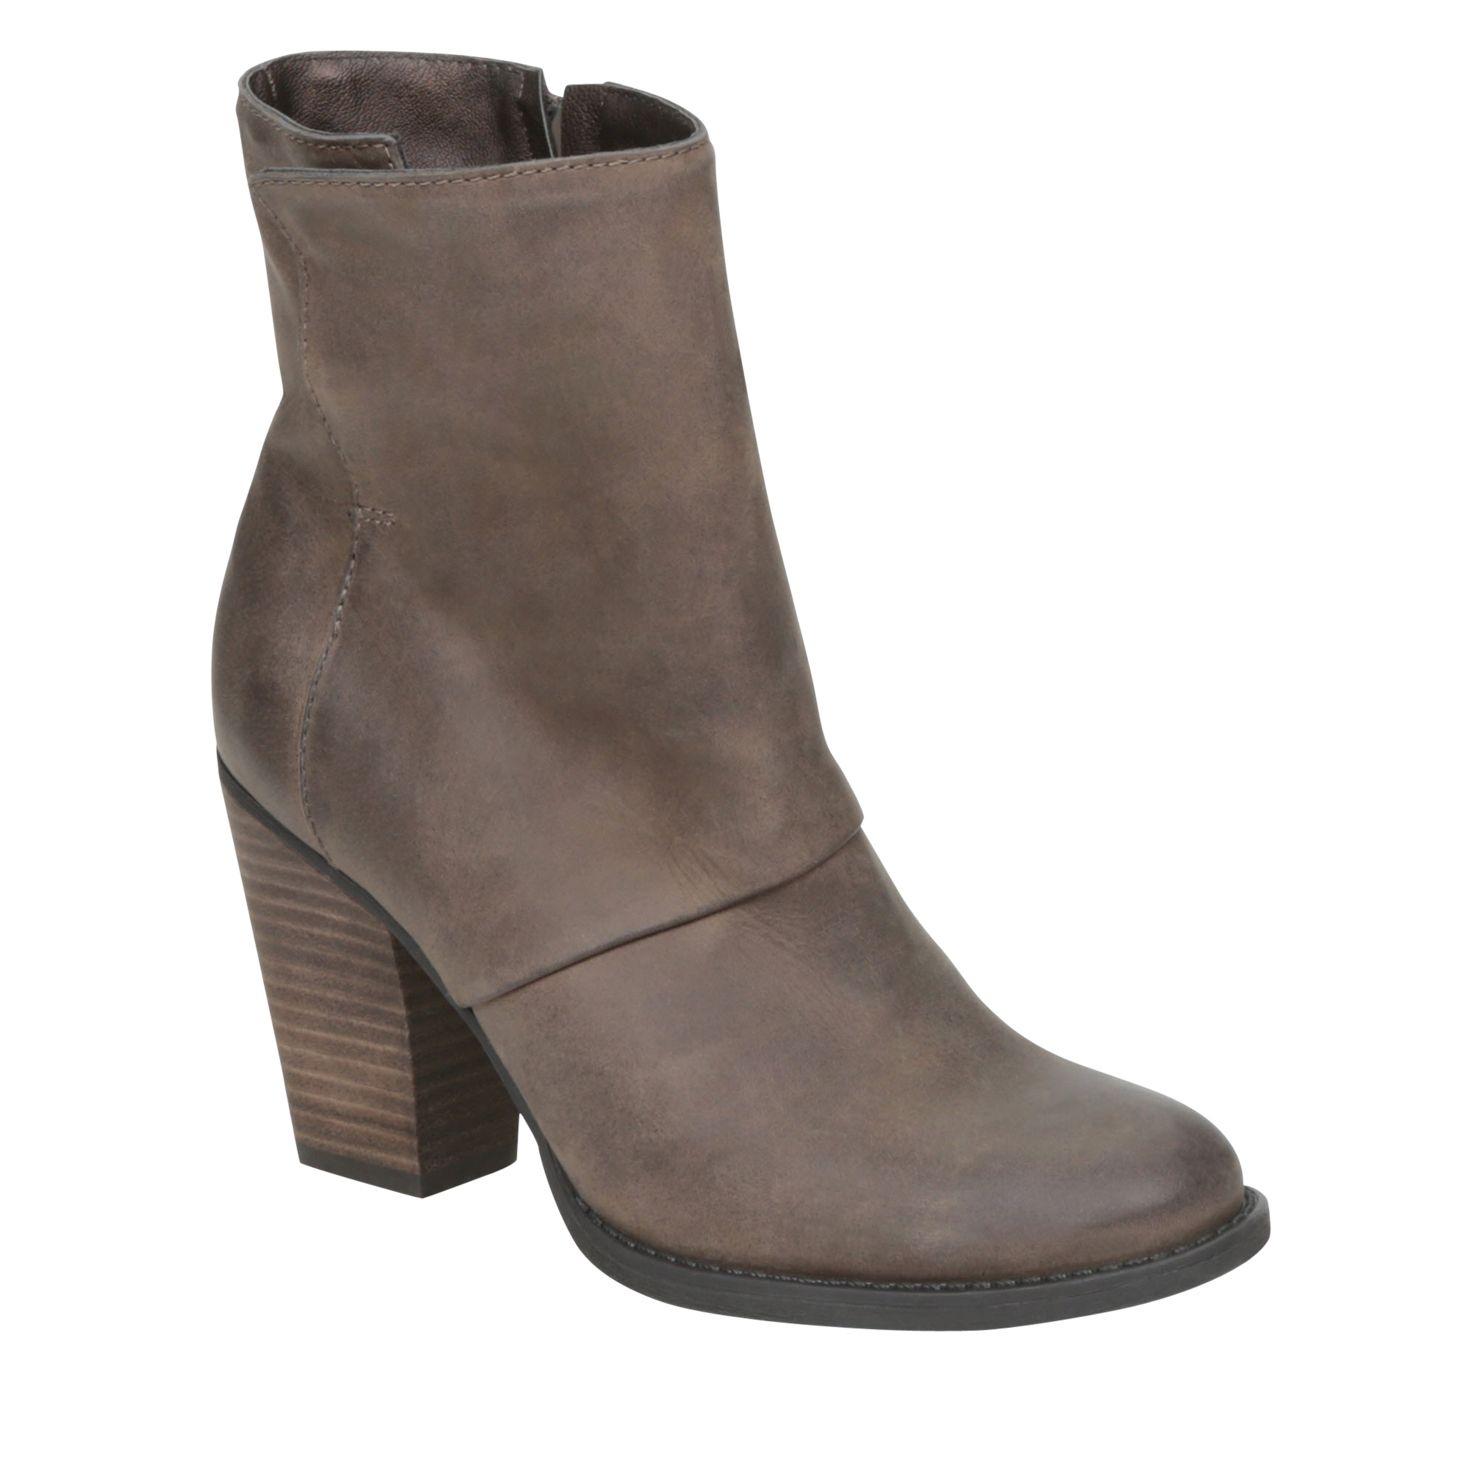 Aldo Shoes Us Stores